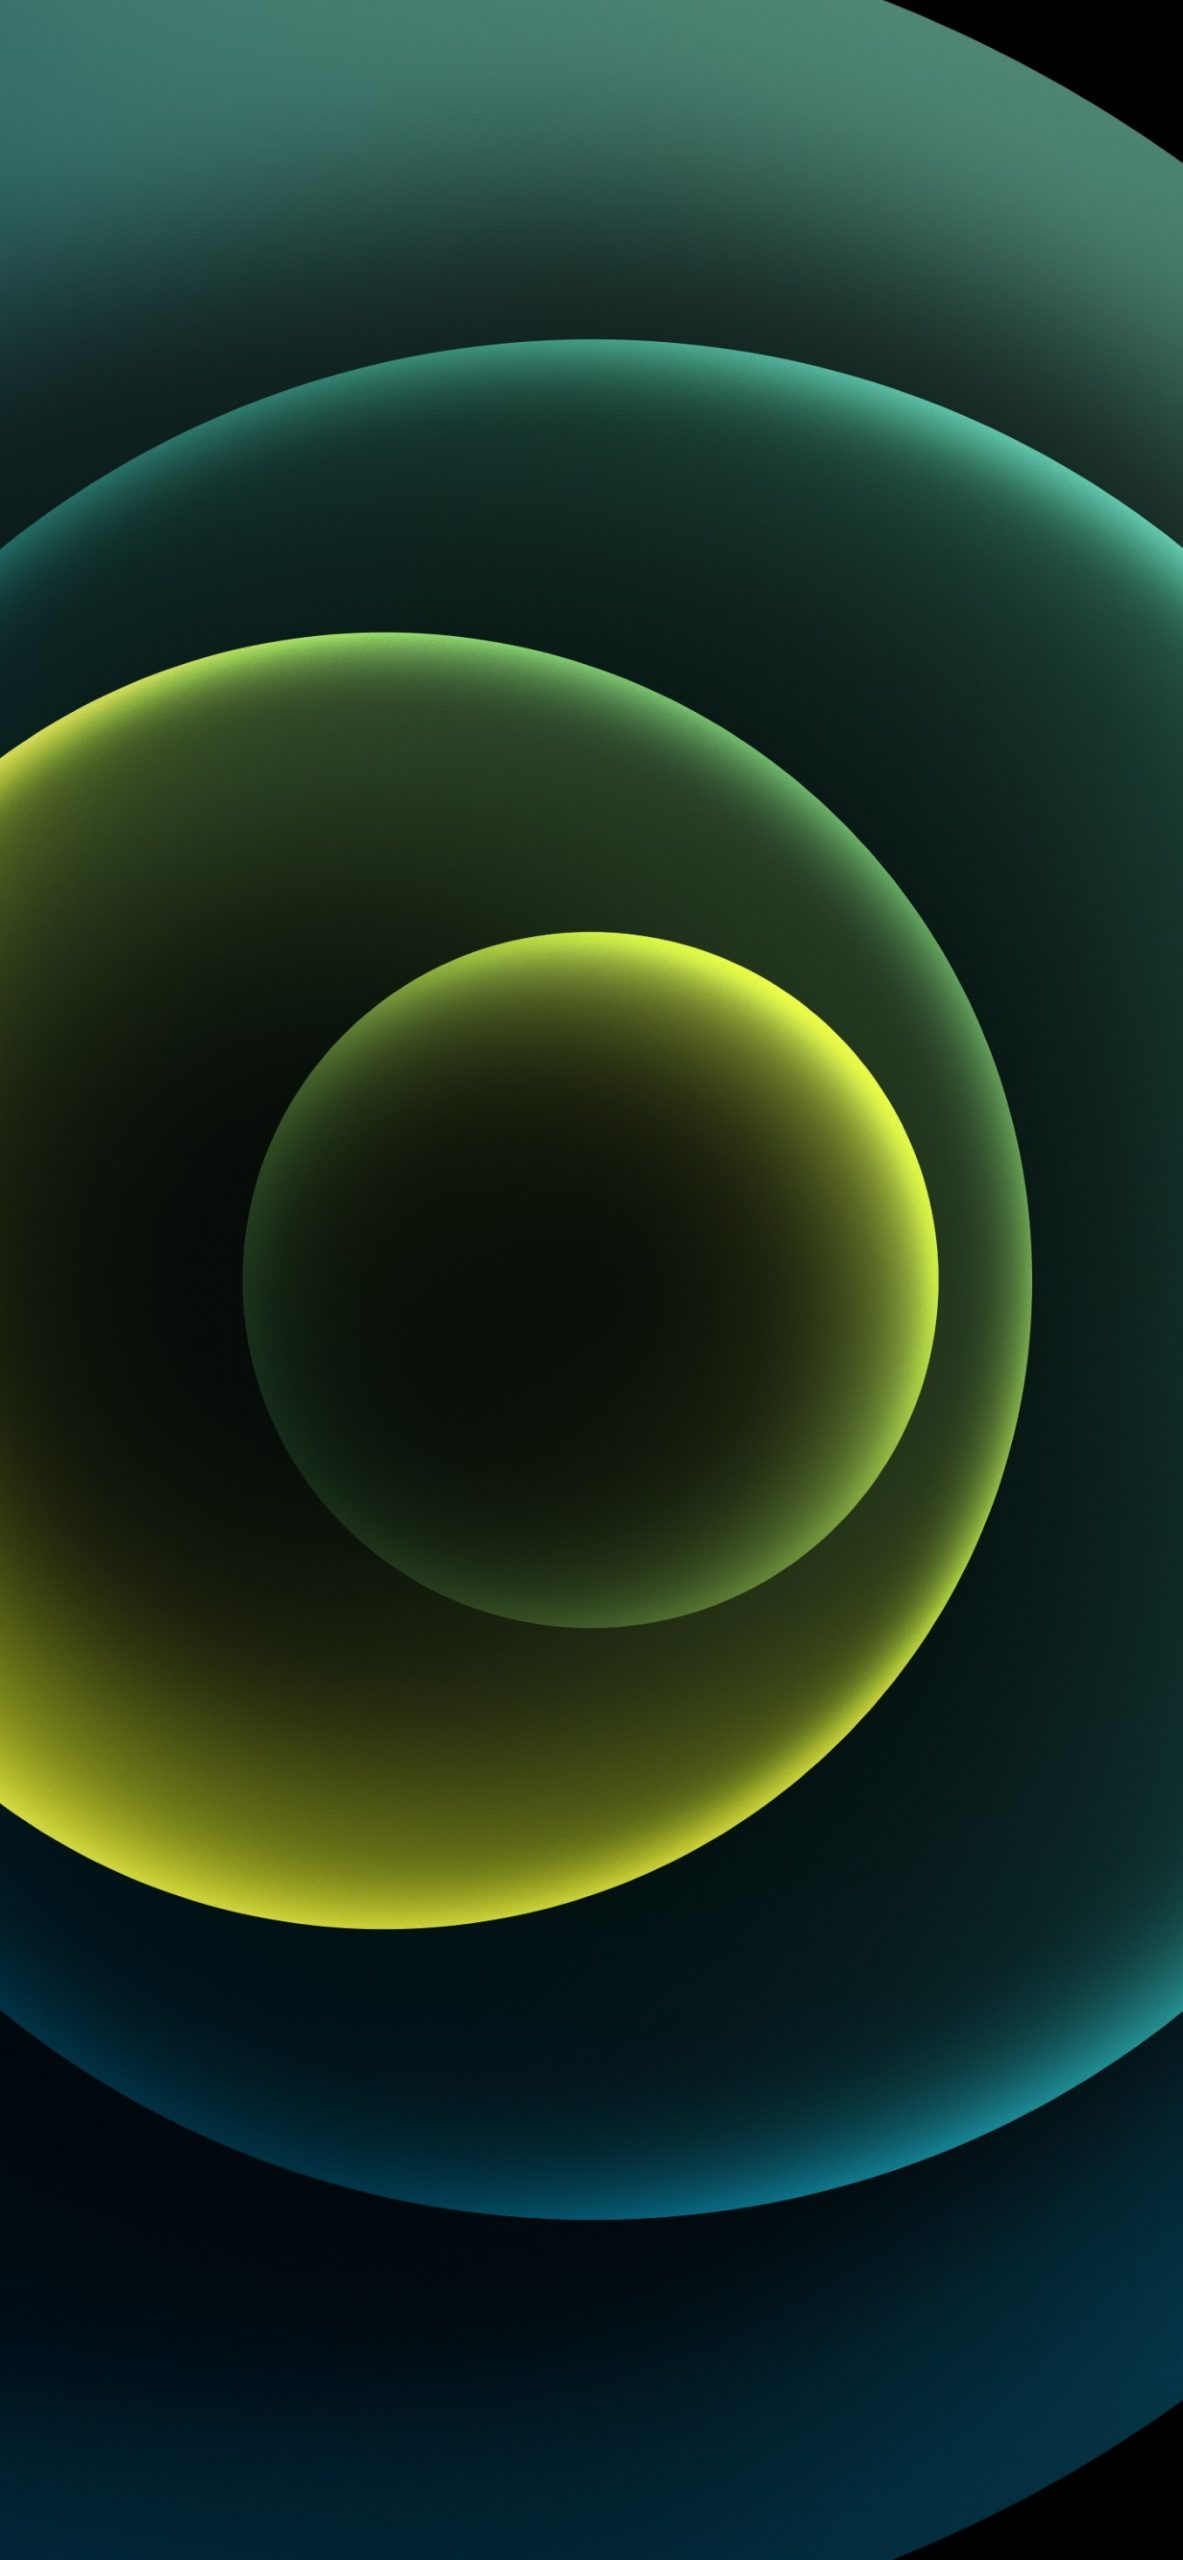 iphone 12 orb dark green scaled